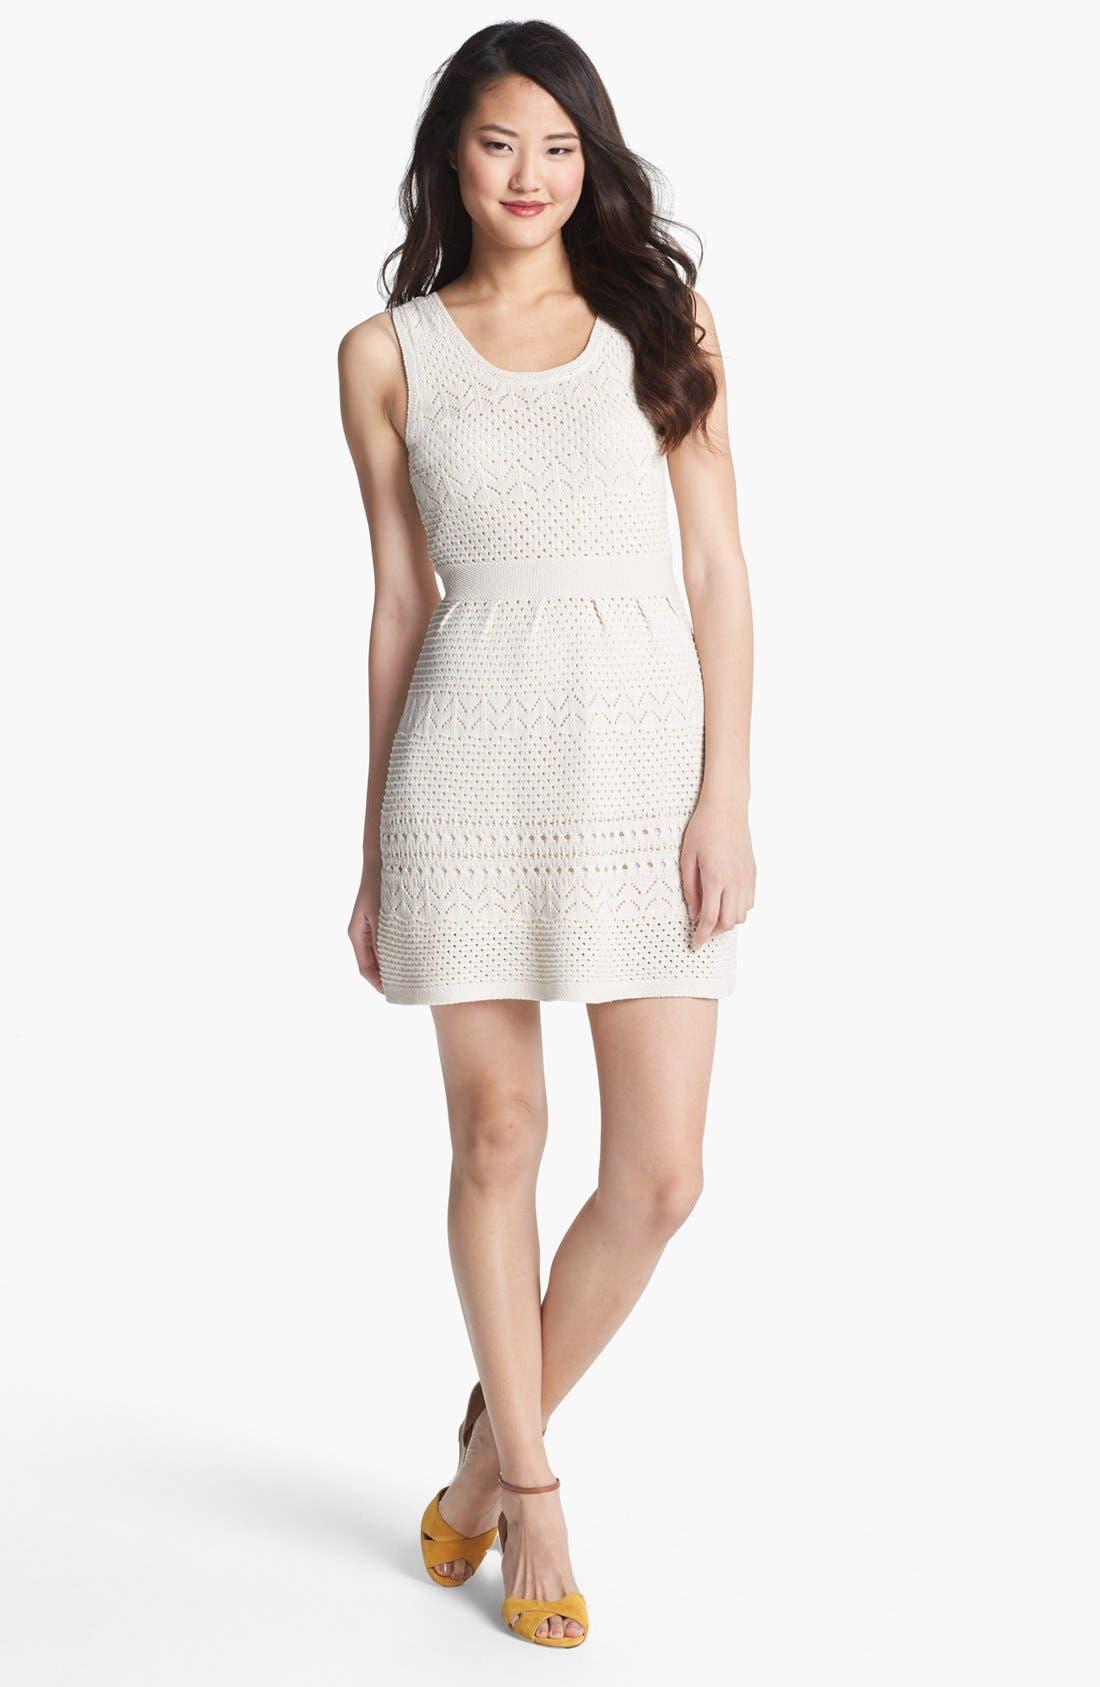 Main Image - Jessica Simpson 'Belchic' Open Knit Dress